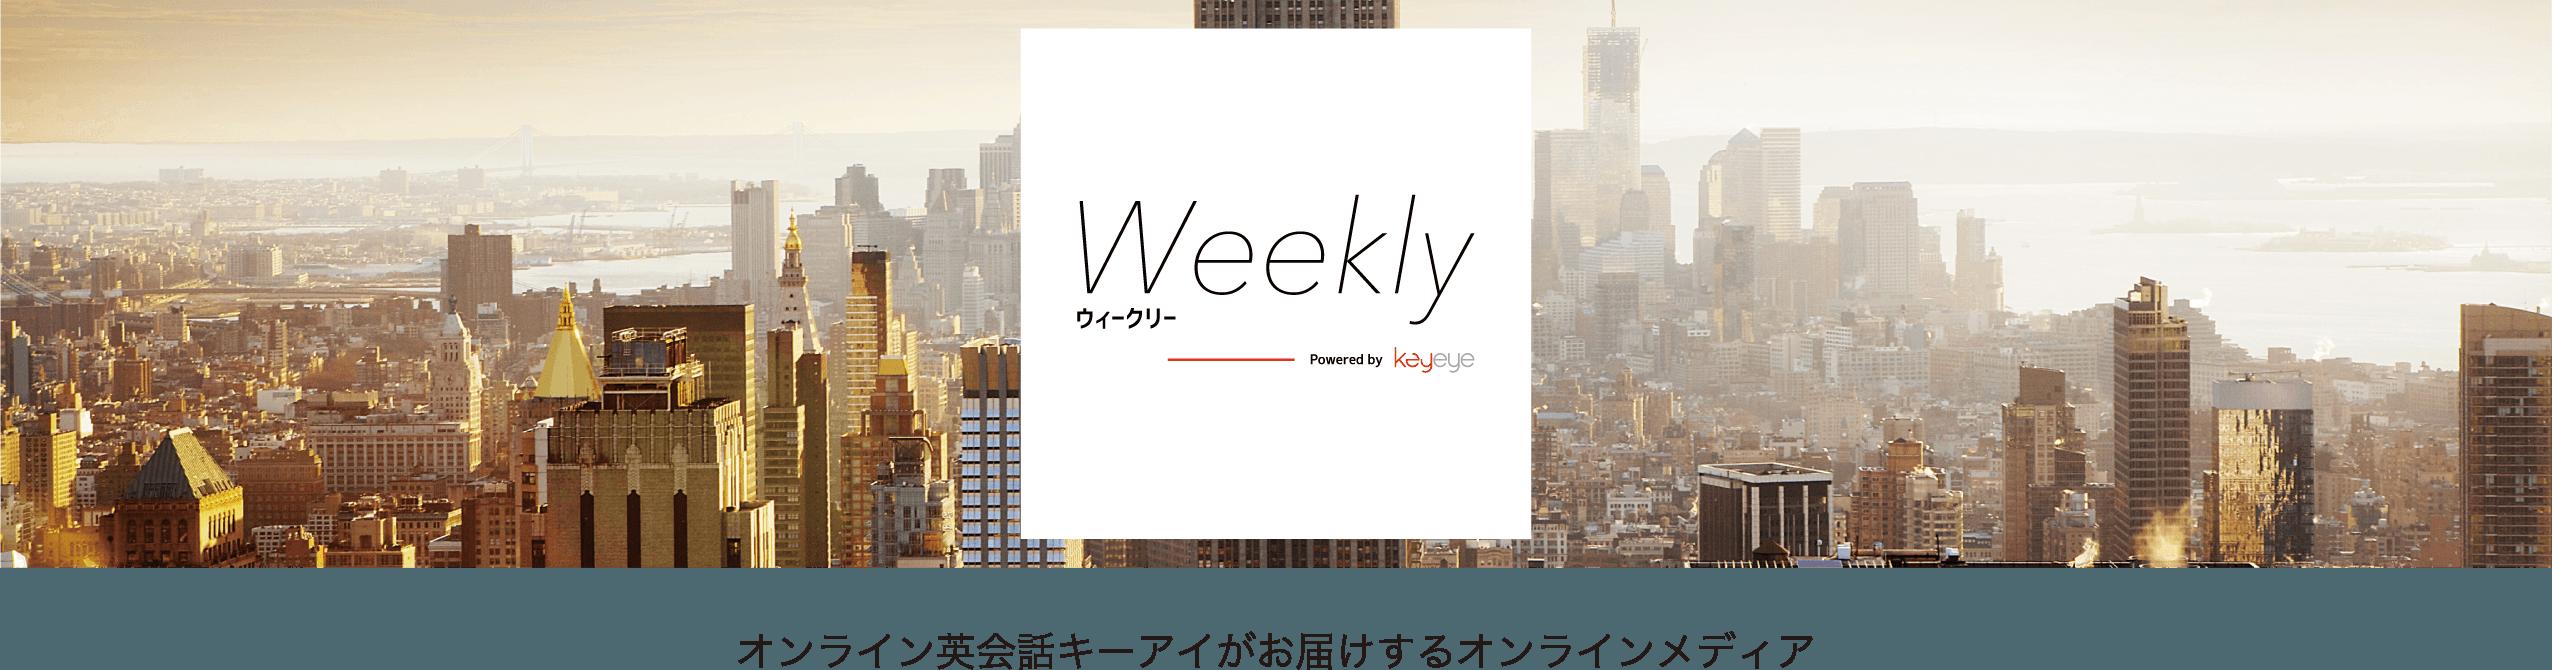 WEEKLY | ウィークリー